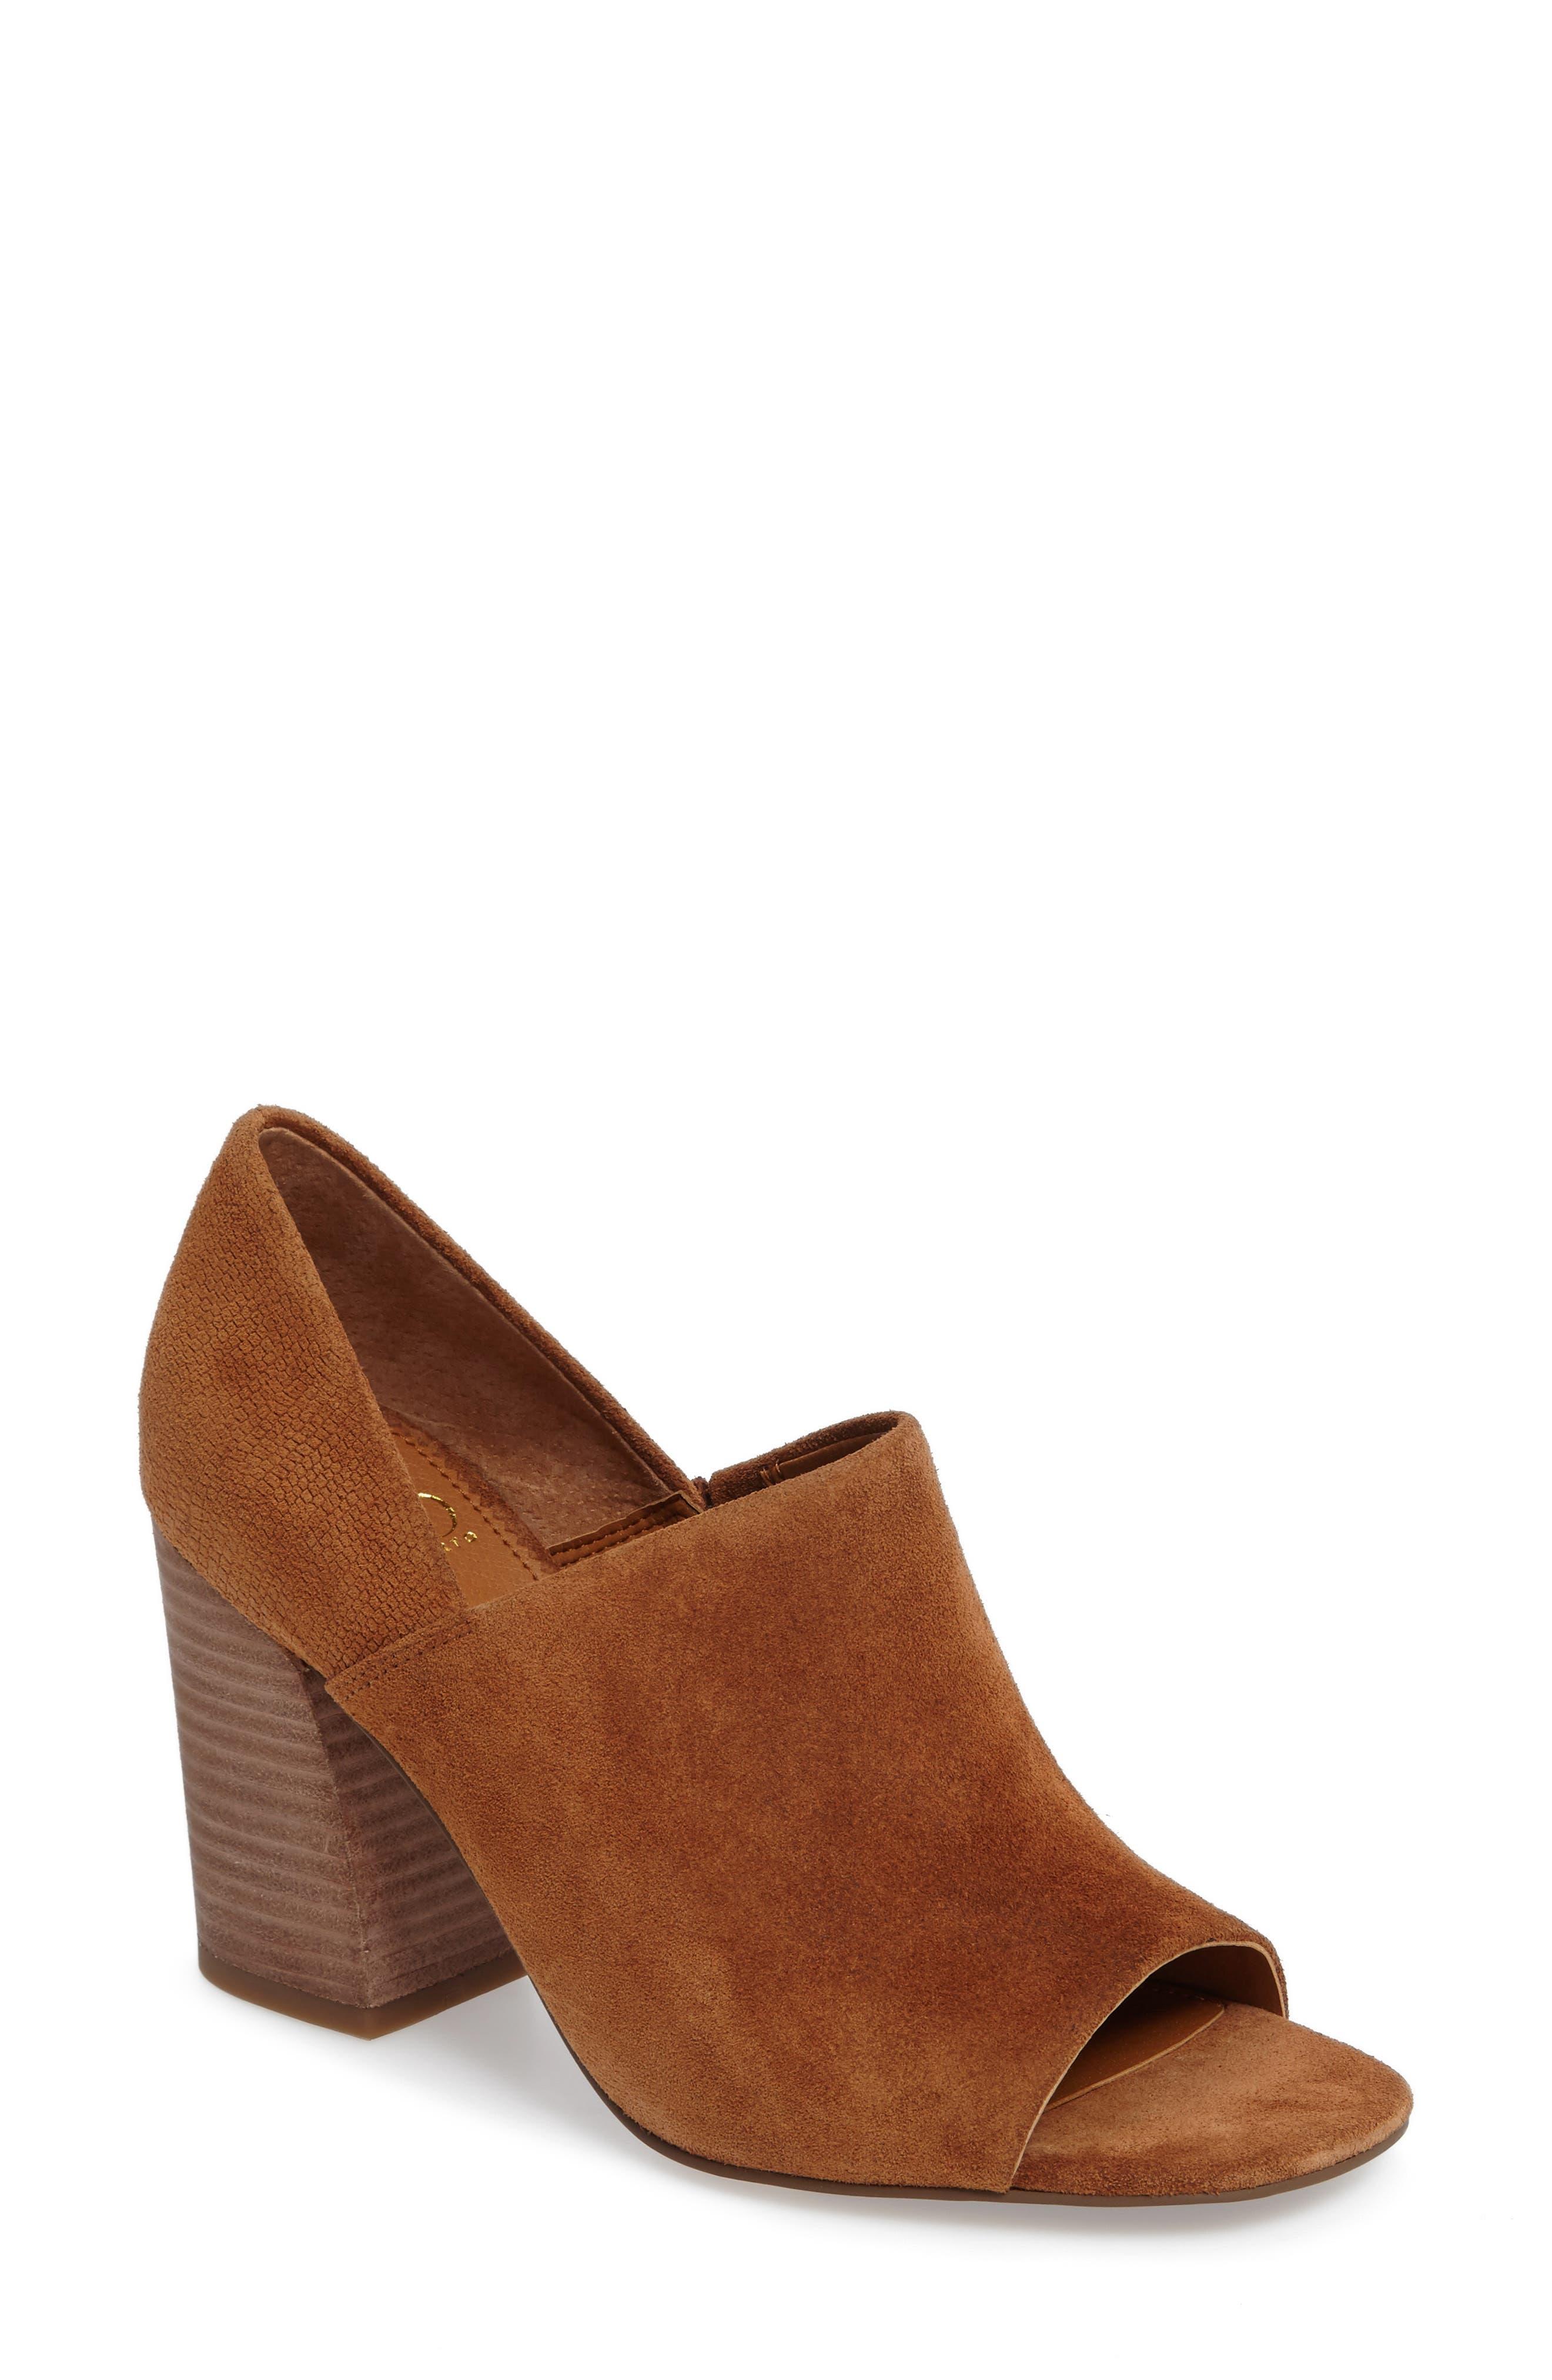 Main Image - SARTO by Franco Sarto Ellison Block Heel Sandal (Women)